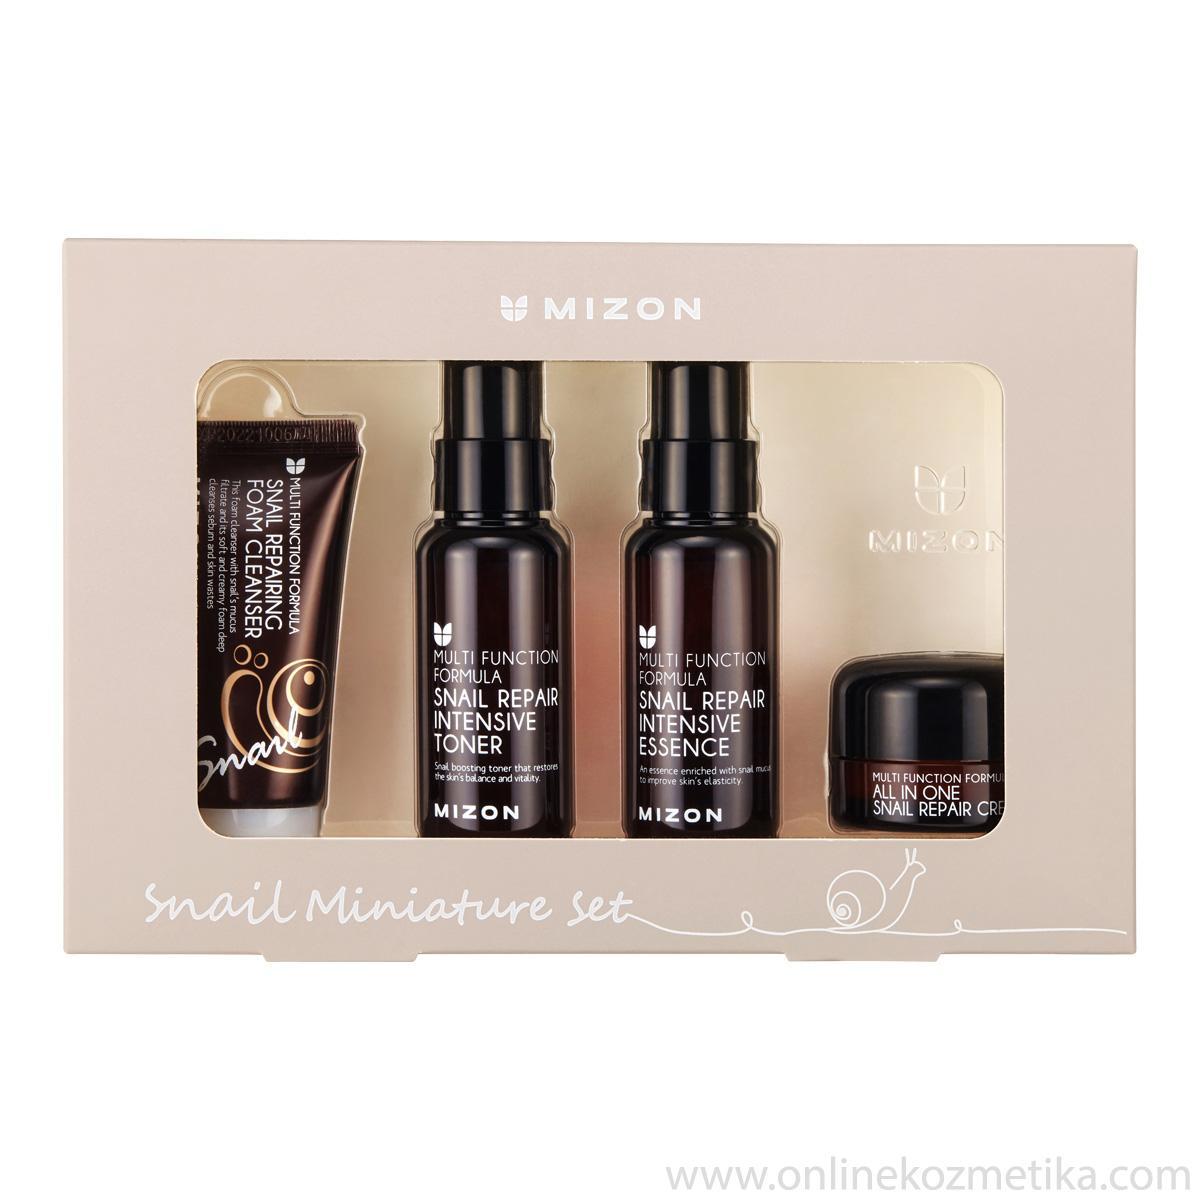 Mizon Snail Miniature Set (Cleanser+Toner+Essence+Cream)